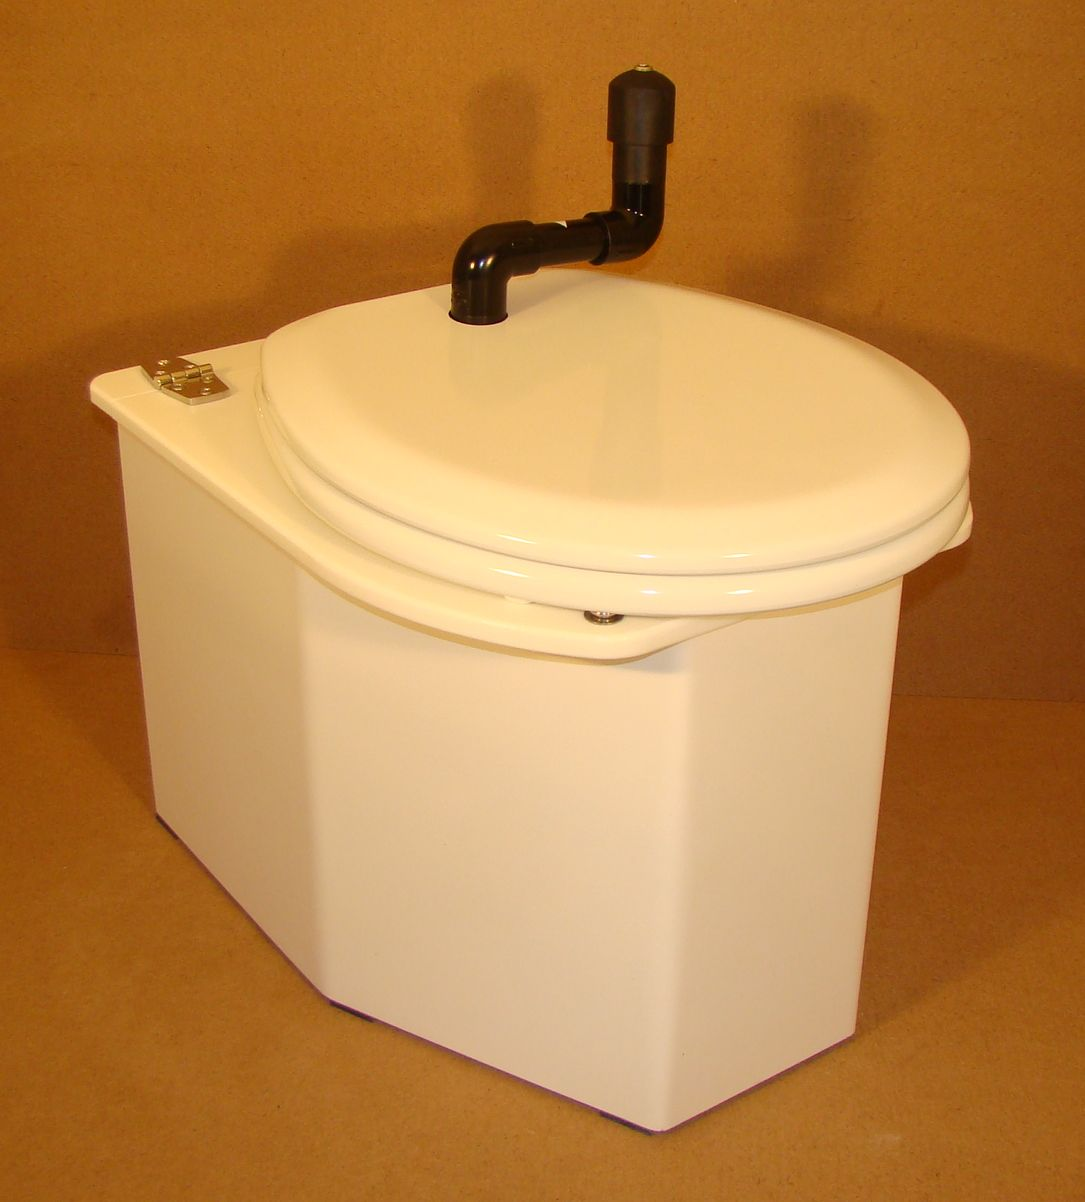 C-Head portable composting toilet system | RV living | Pinterest ...